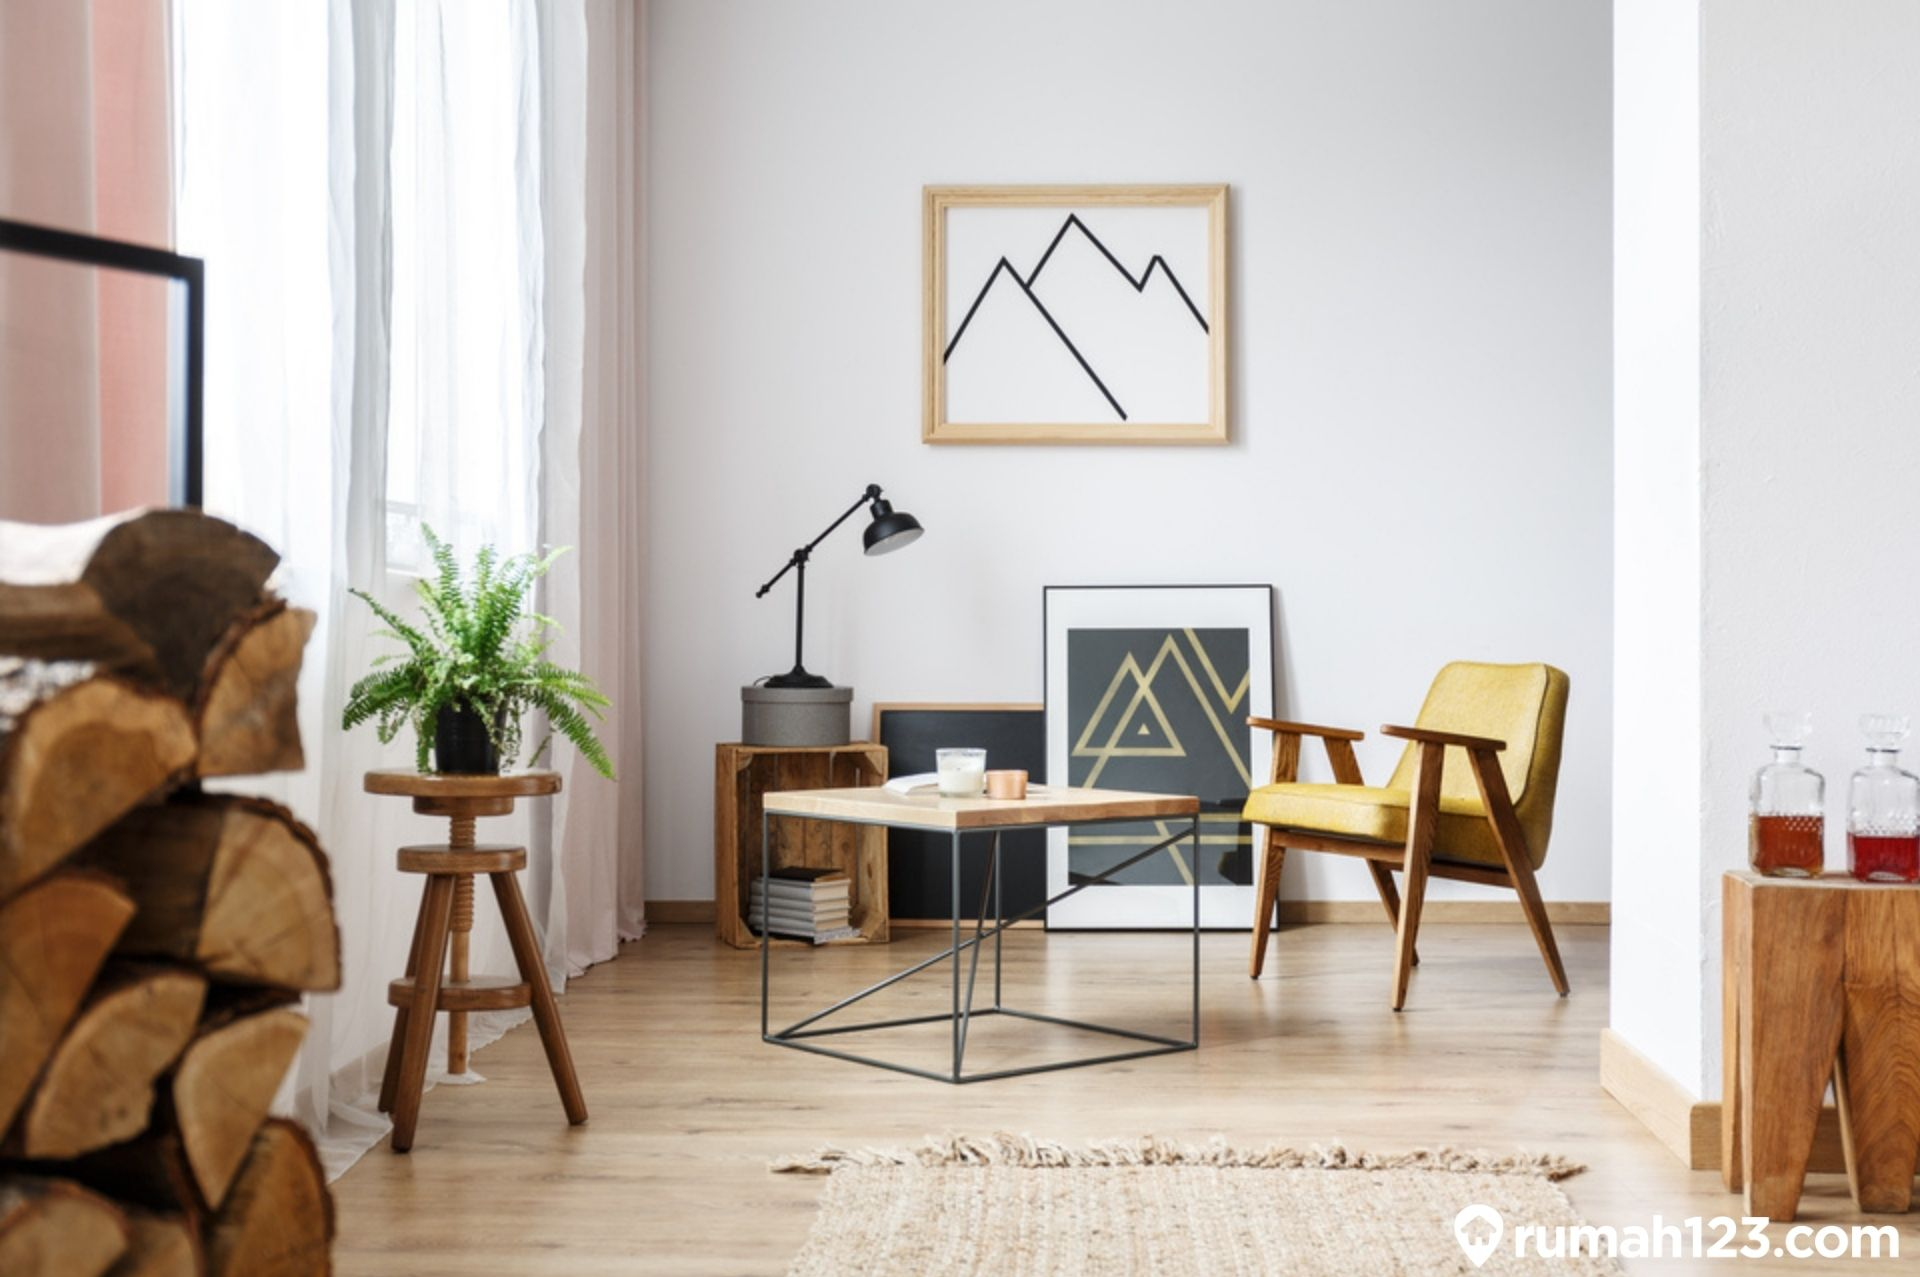 Hasil gambar untuk Desain Interior Skandinavia Pilih Warna-warna Tenang